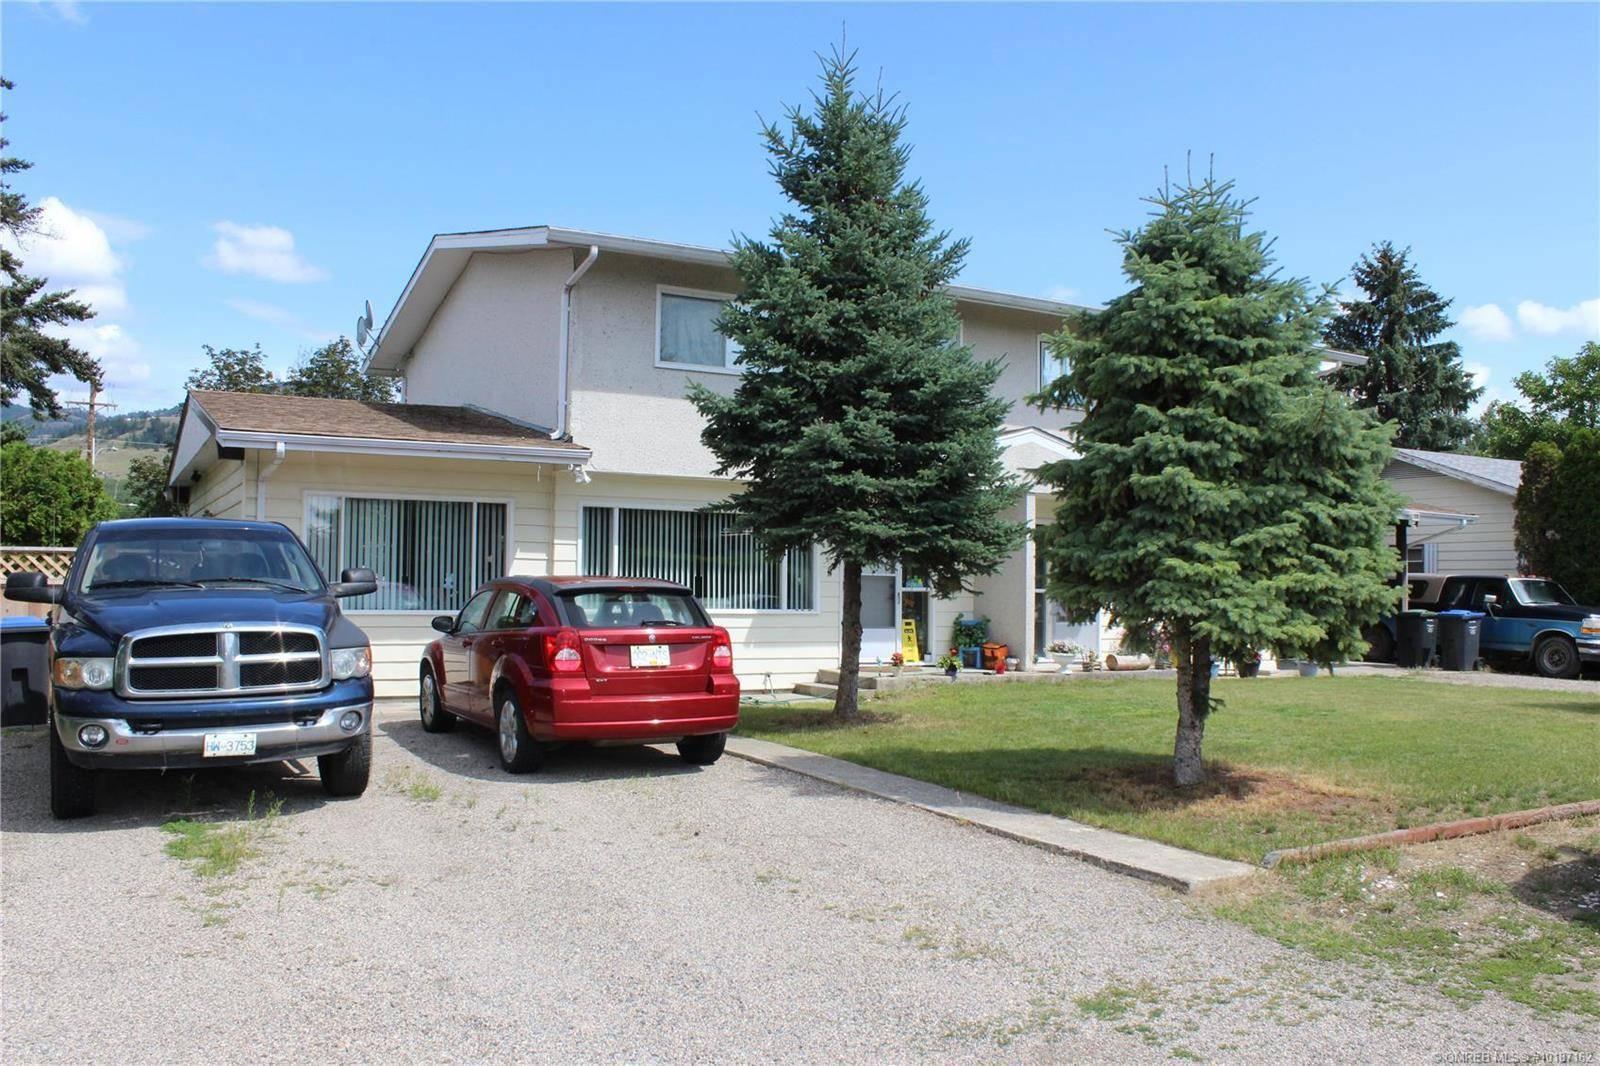 Townhouse for sale at 146 Adventure Rd Kelowna British Columbia - MLS: 10187162